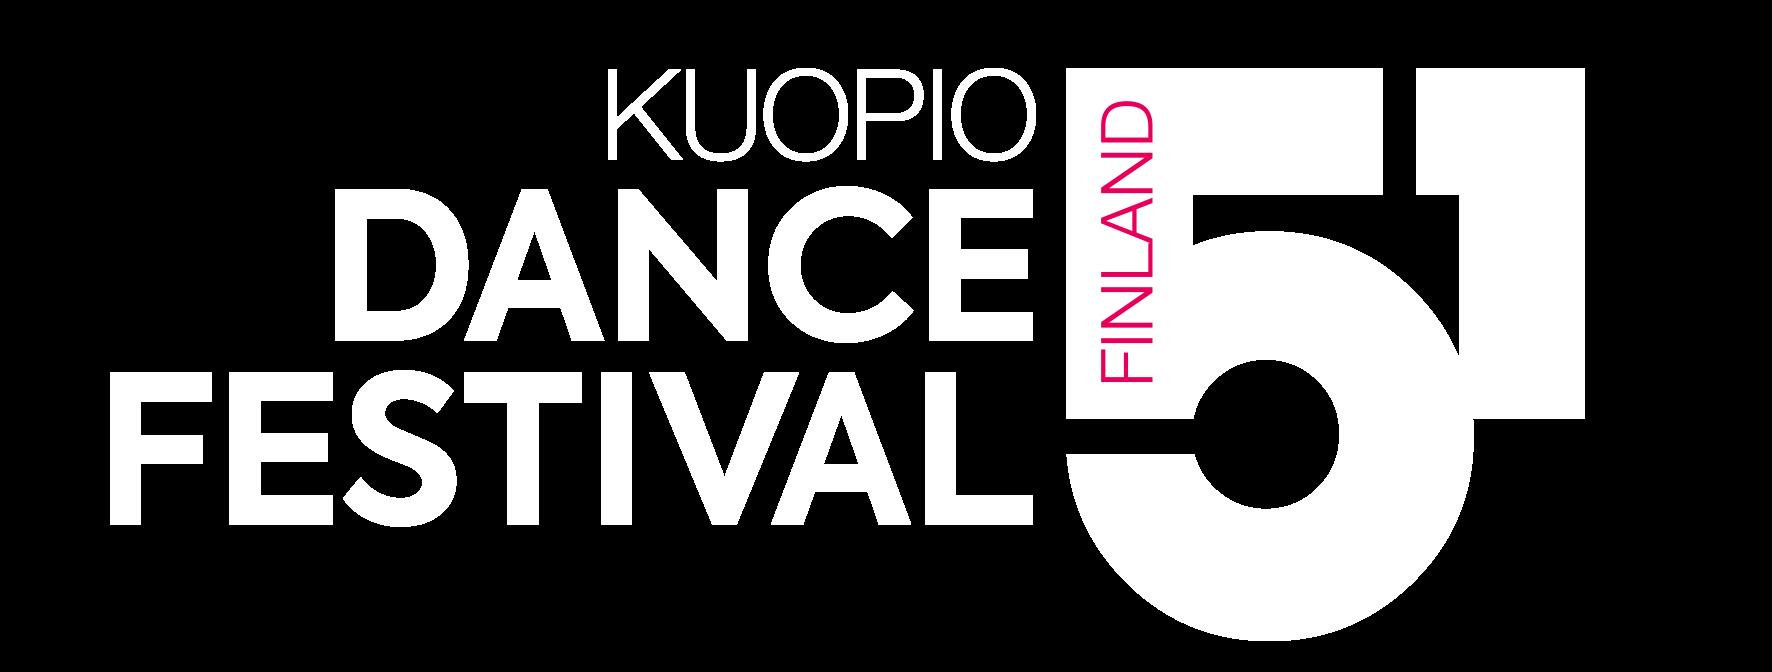 Kuopio Dance Festival Logo 2020 original